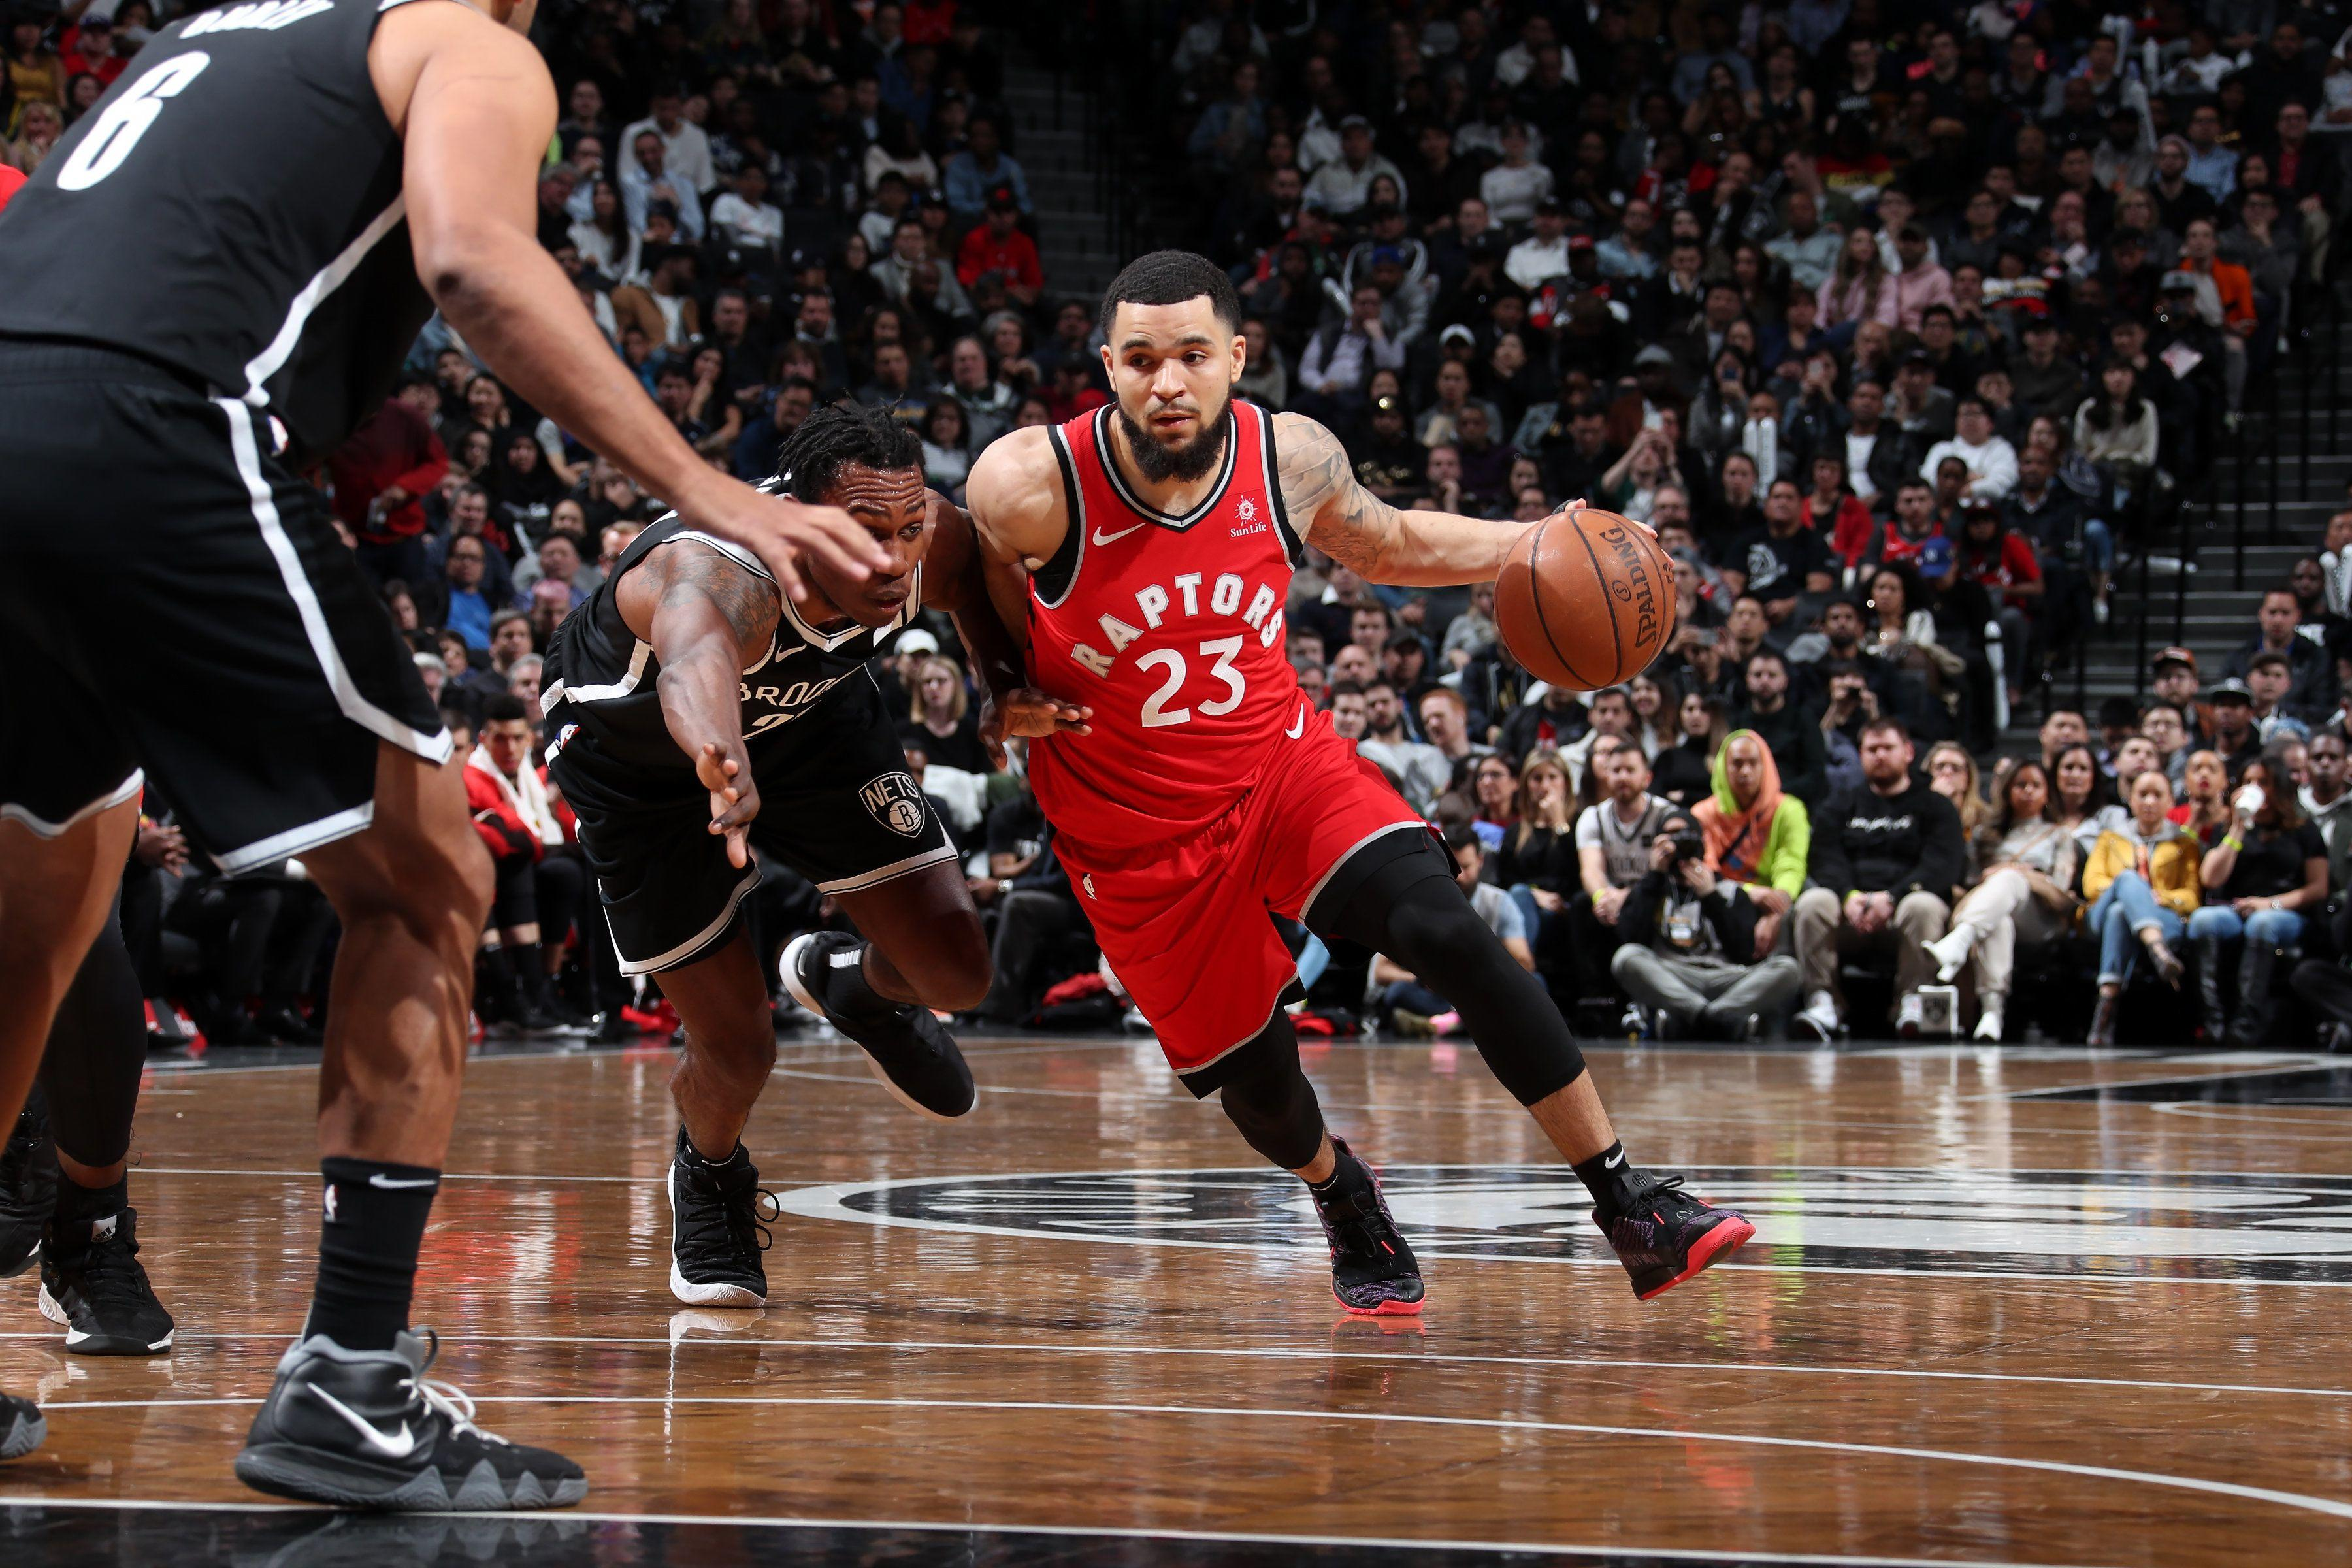 Nets Vs Raptors: 10 Things Raptors Vs. Nets